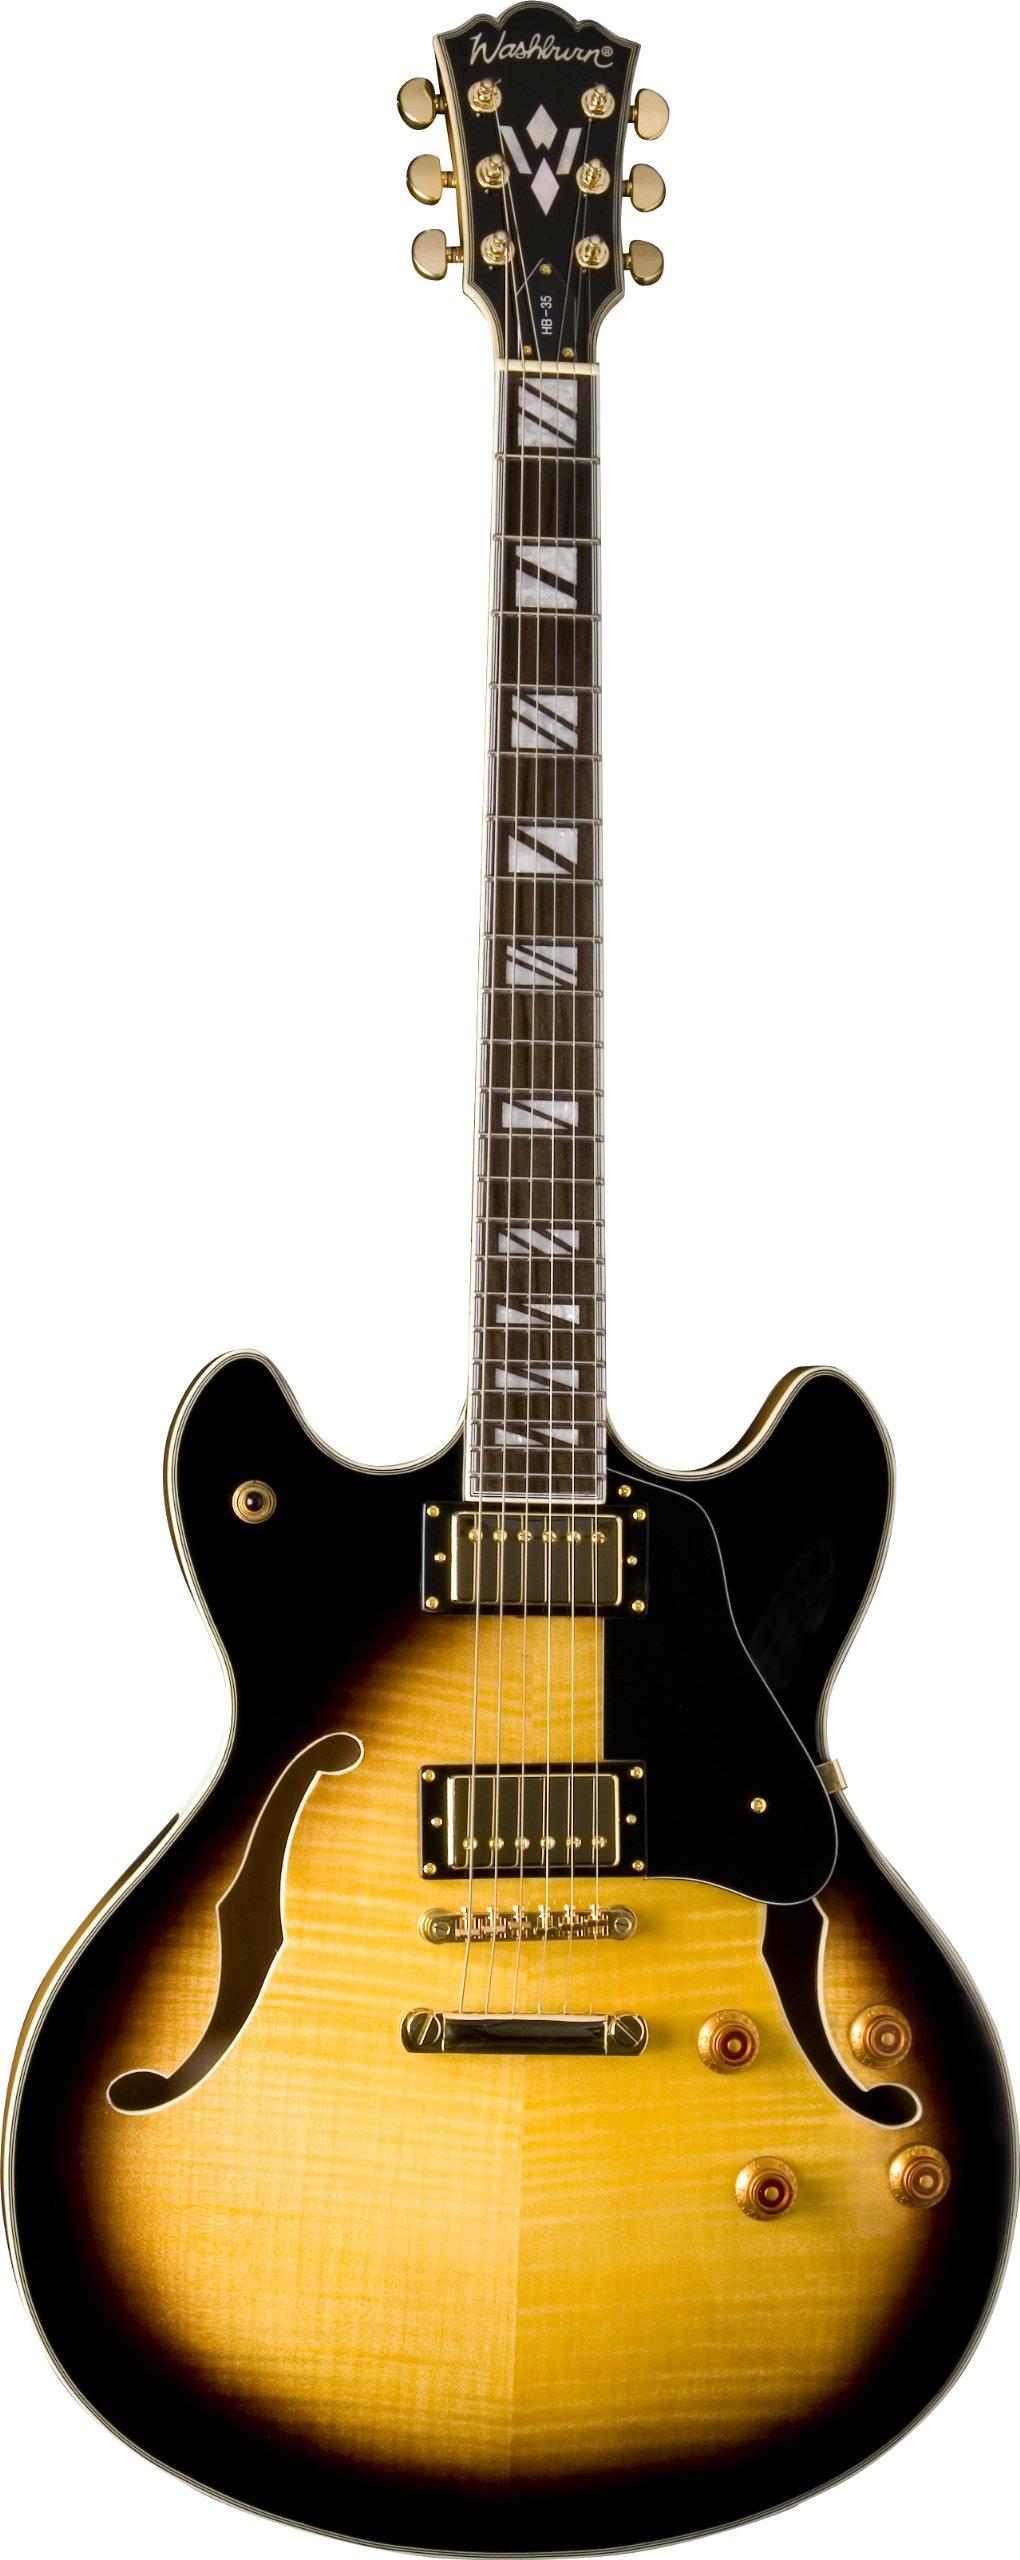 Cheap Washburn HB Series HB35TSK Hollow-Body Electric Guitar Tobacco SunBurst Black Friday & Cyber Monday 2019